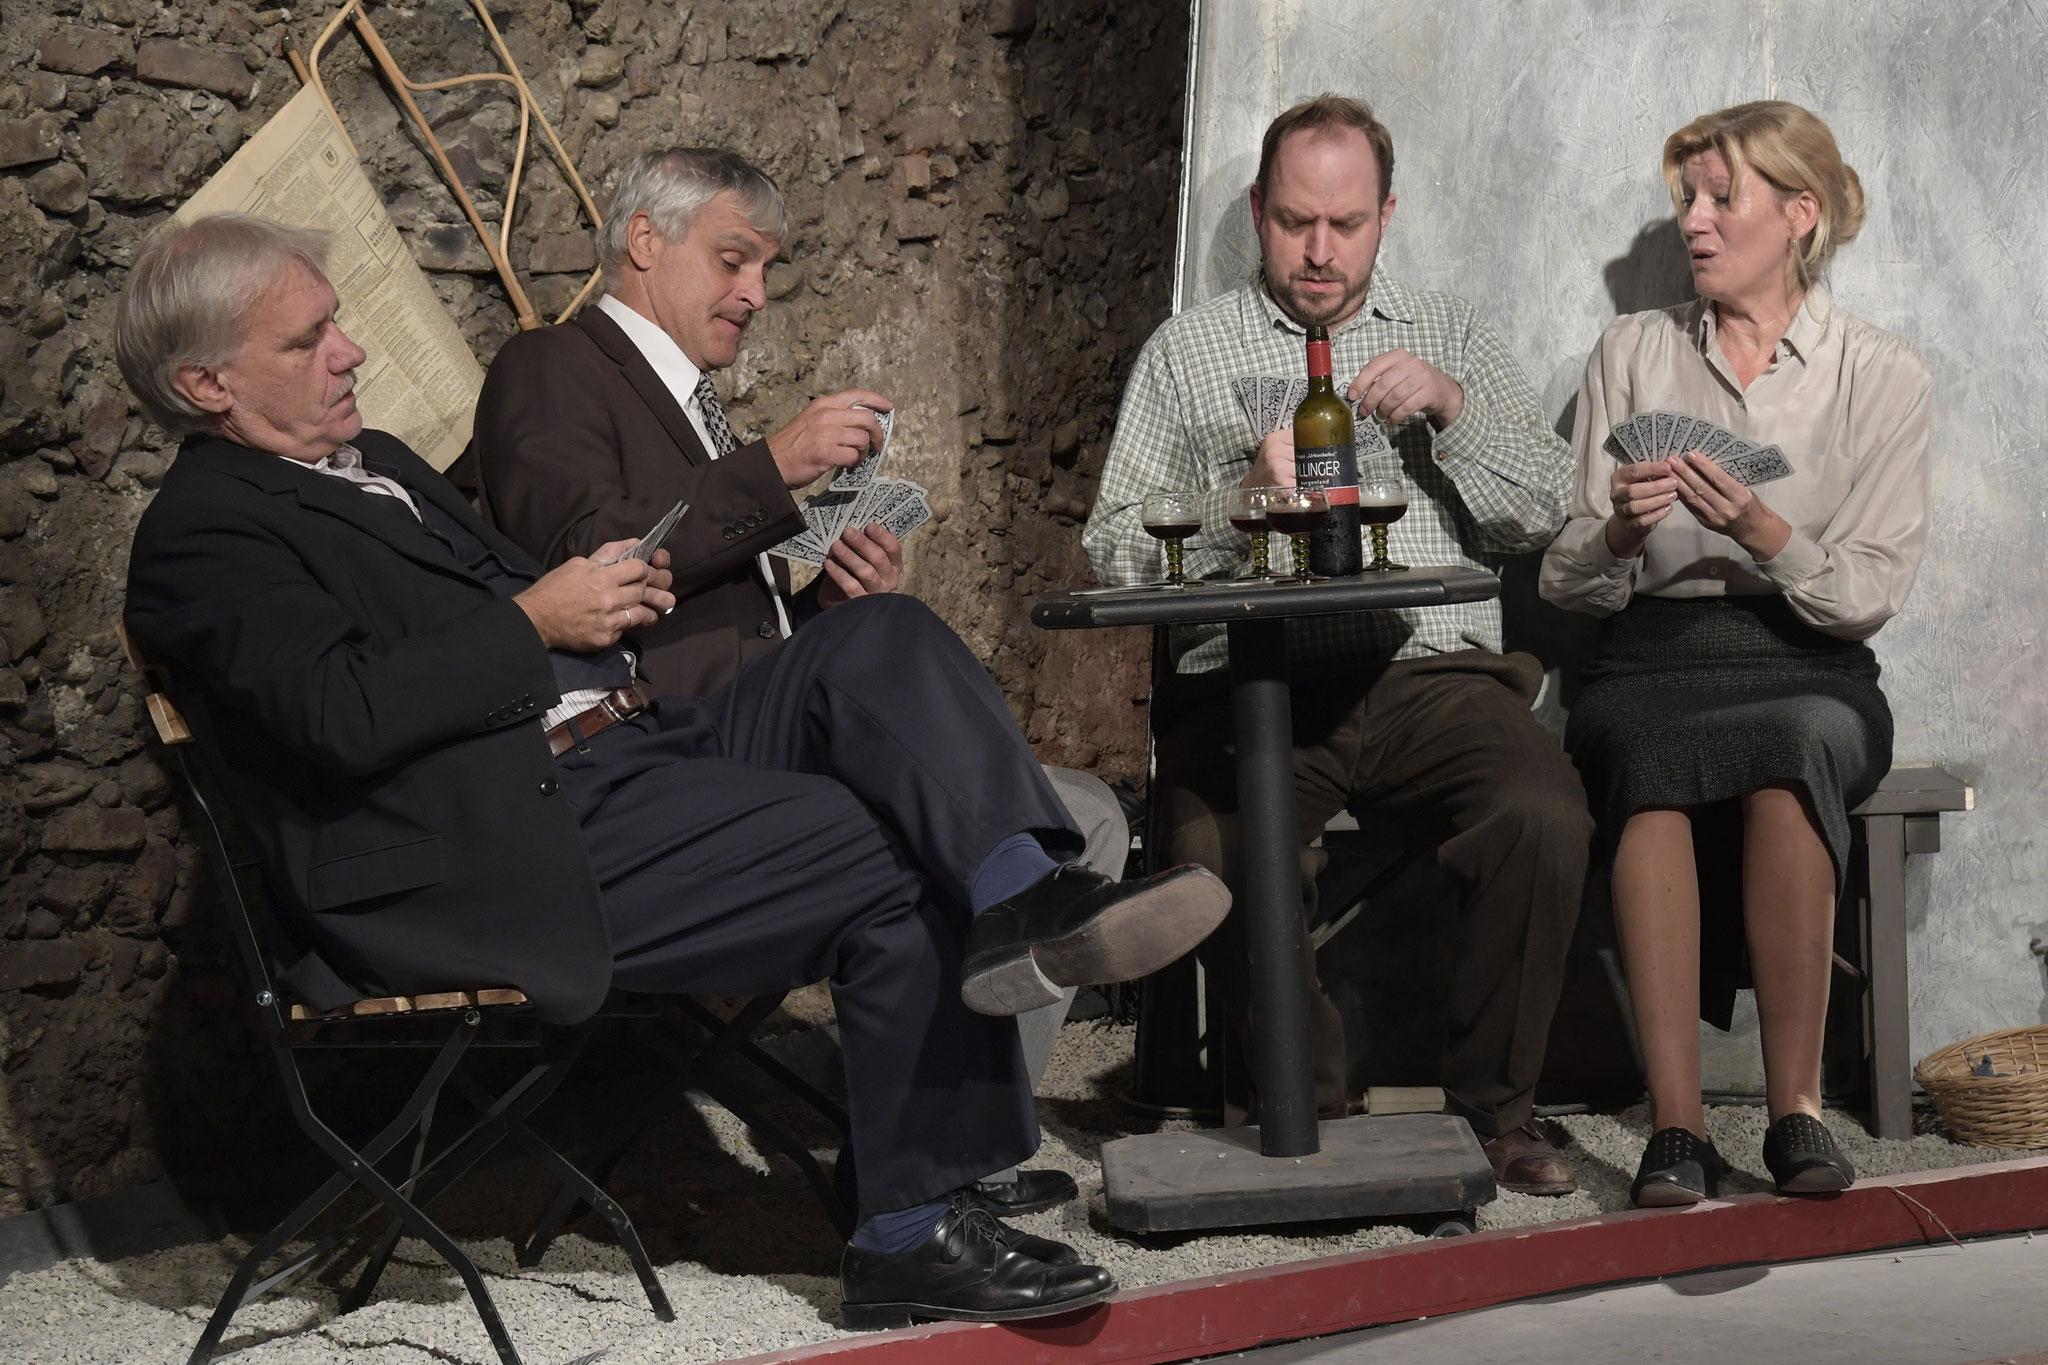 Kurt Engelmann, Franz Rosenthaler, Thomas Zimmermann, Petra Kamptner